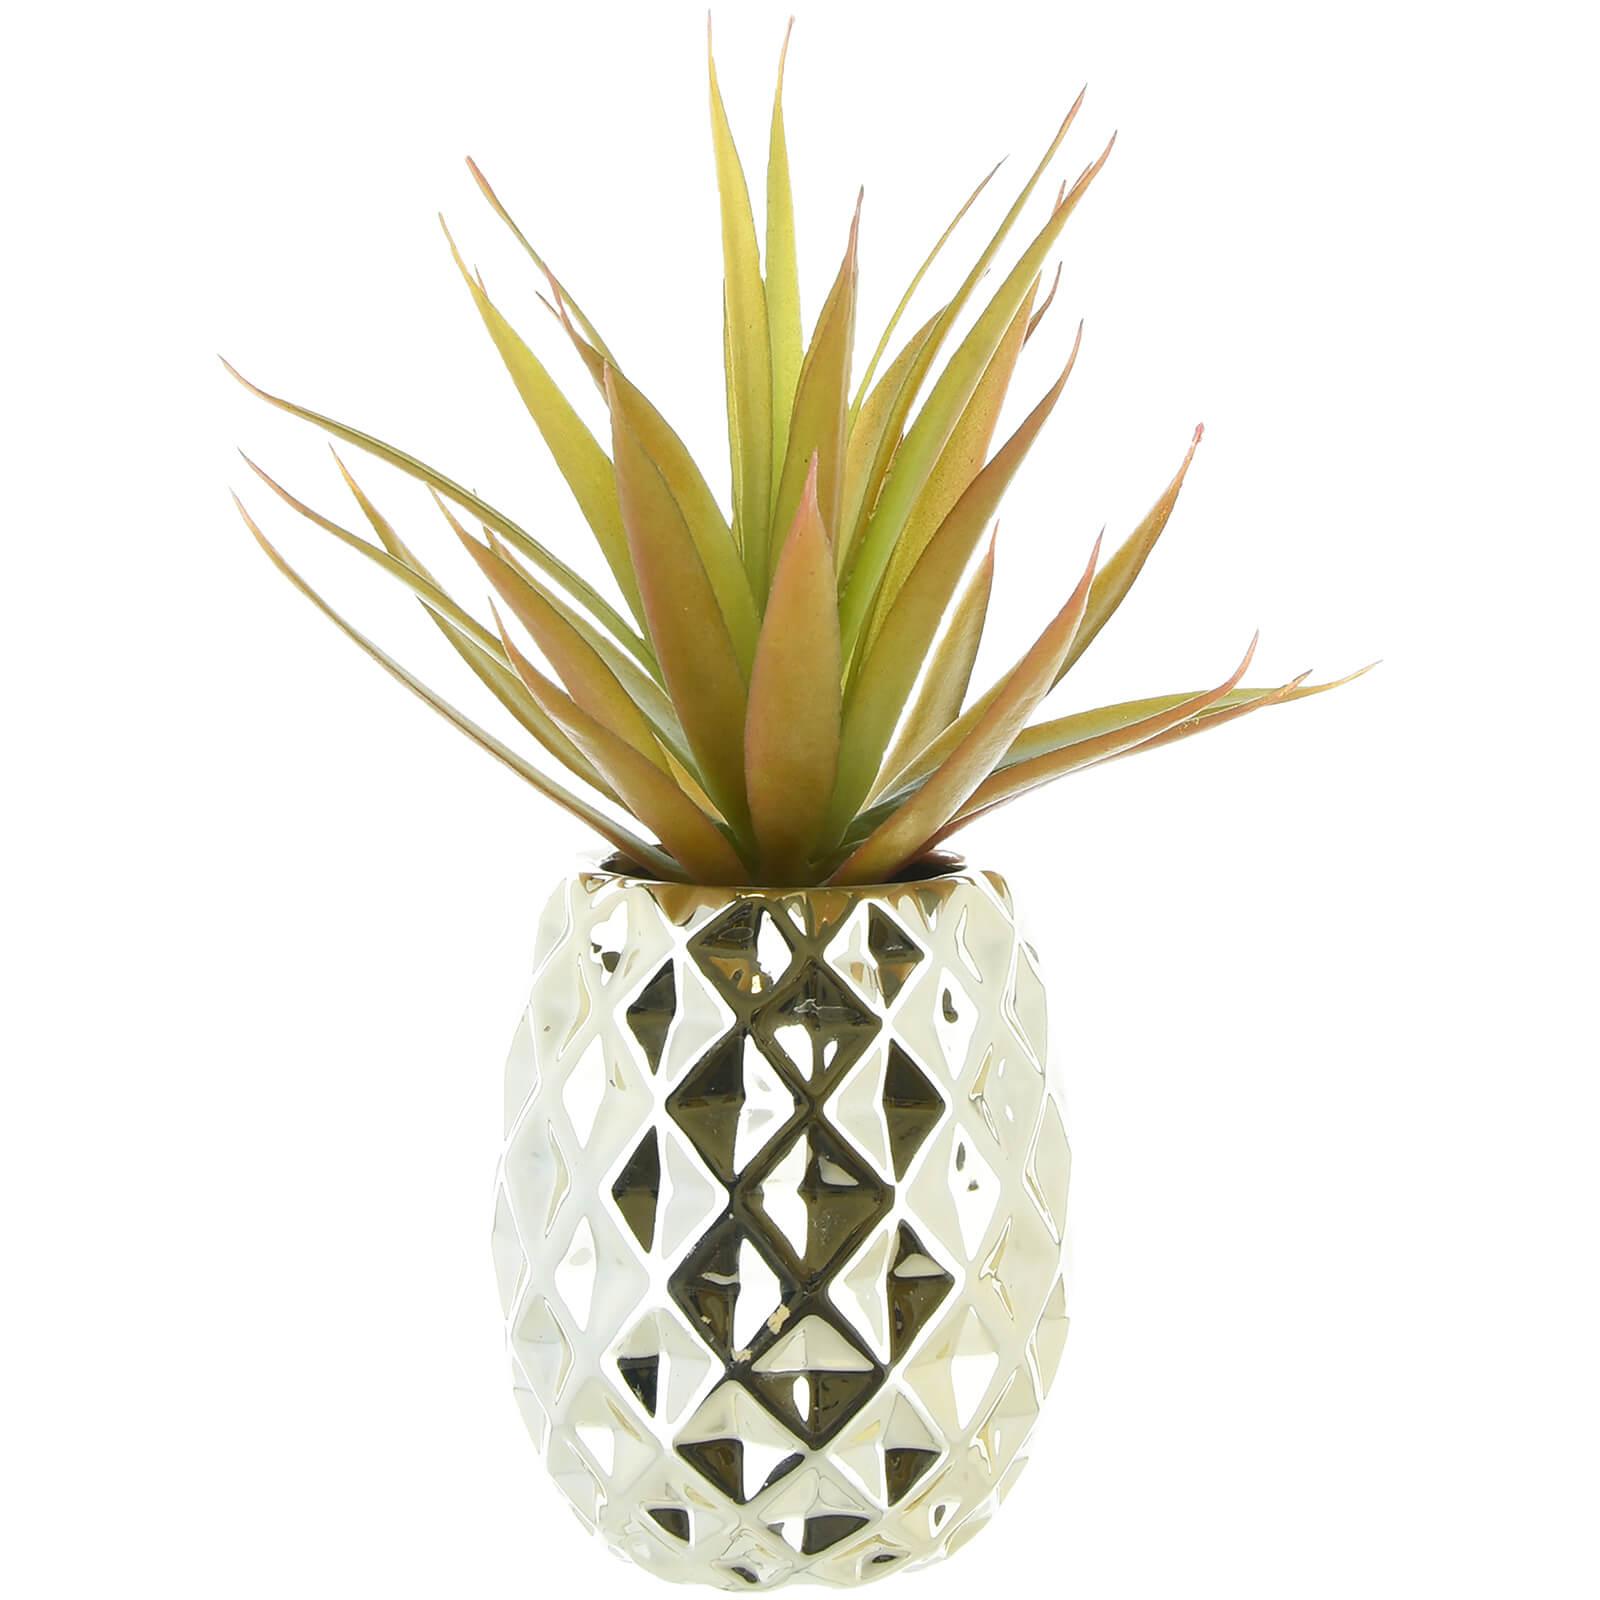 Image of Faux Aloe Vera Succulent Plant - Pineapple Pot